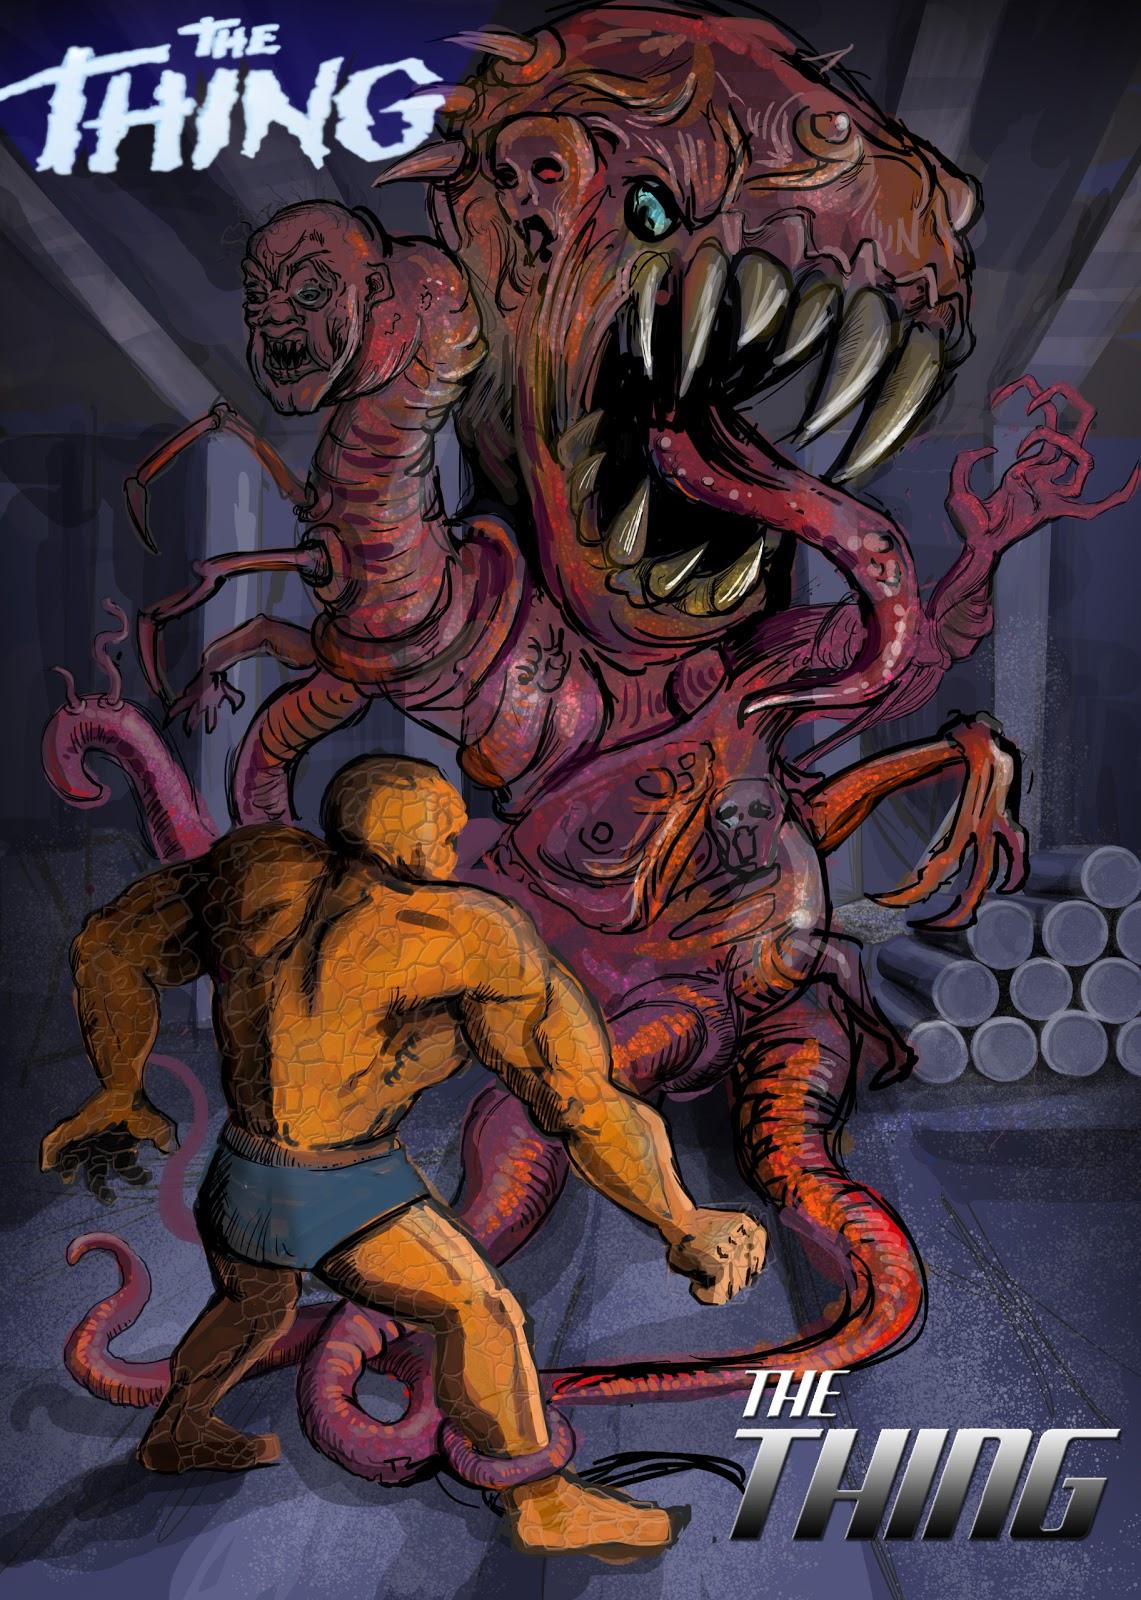 The Thing vs The ThingXenomorph Vs The Thing